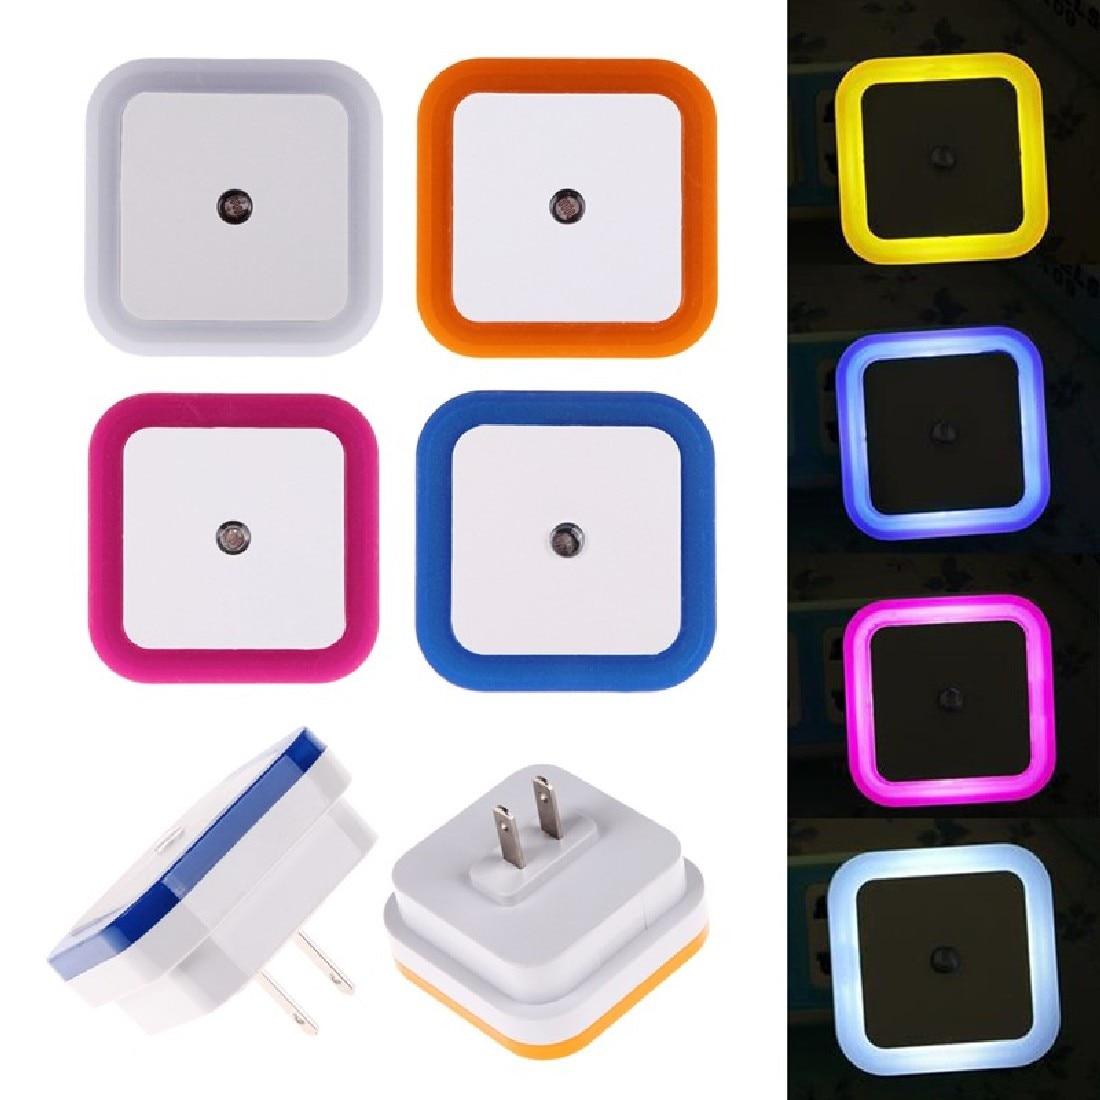 Light Sensor Control Night Light Mini US Plug Novelty Square Bedroom Lamp For Baby Gift Romantic Colorful Lights